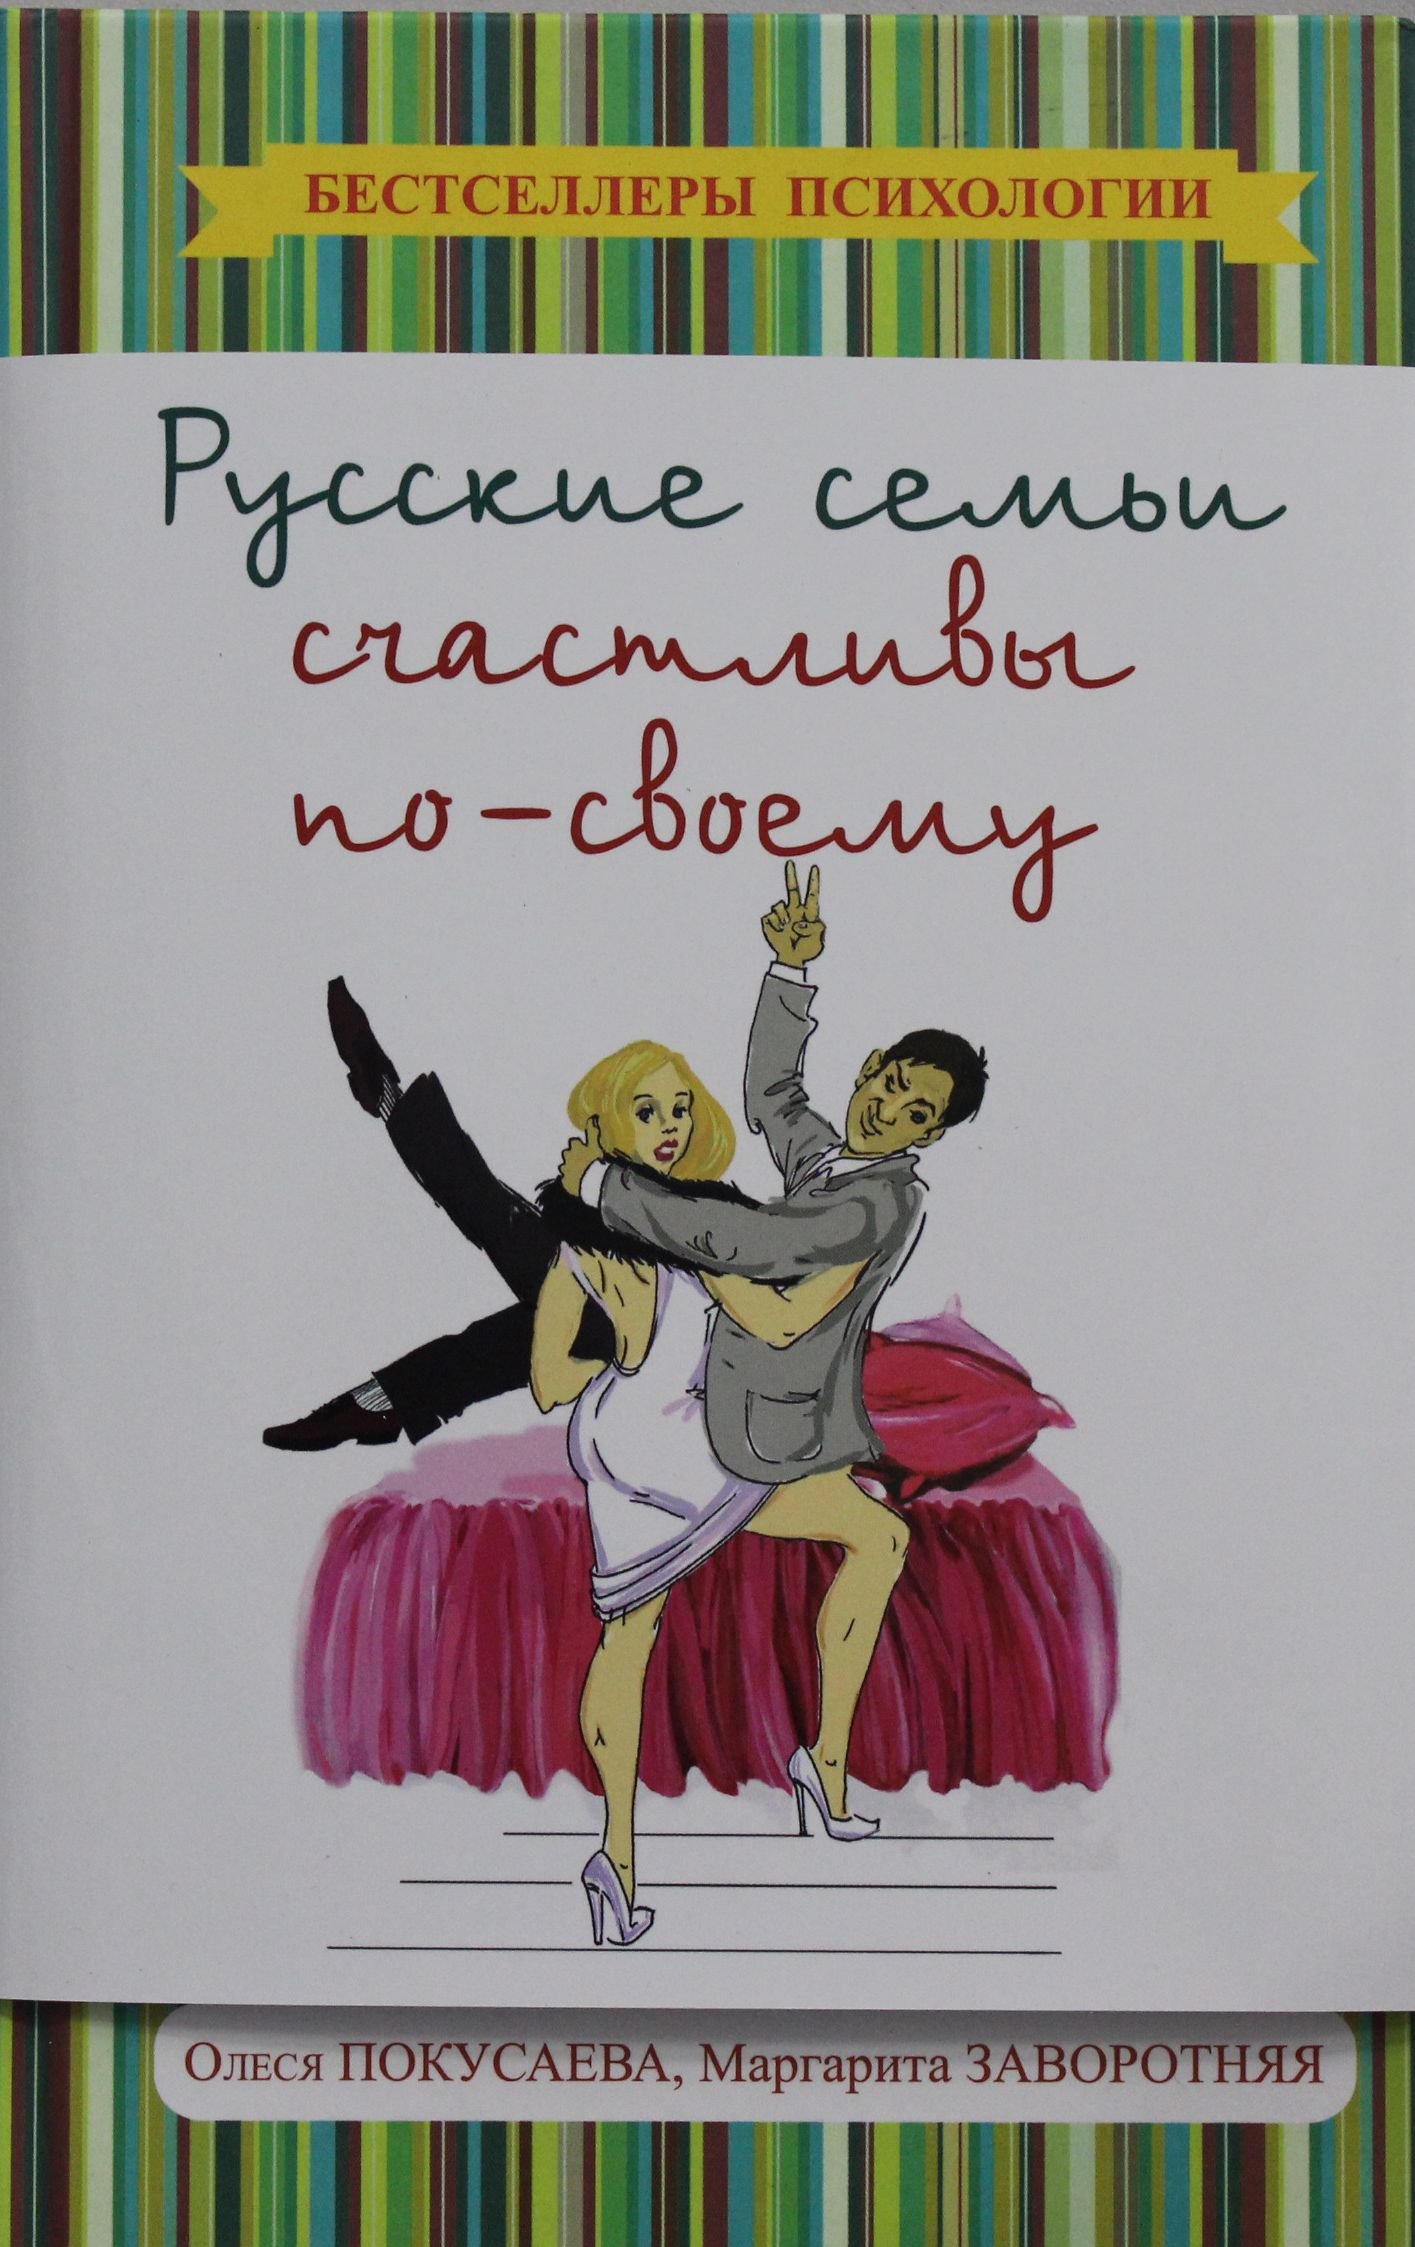 Russkie semi schastlivy po-svoemu